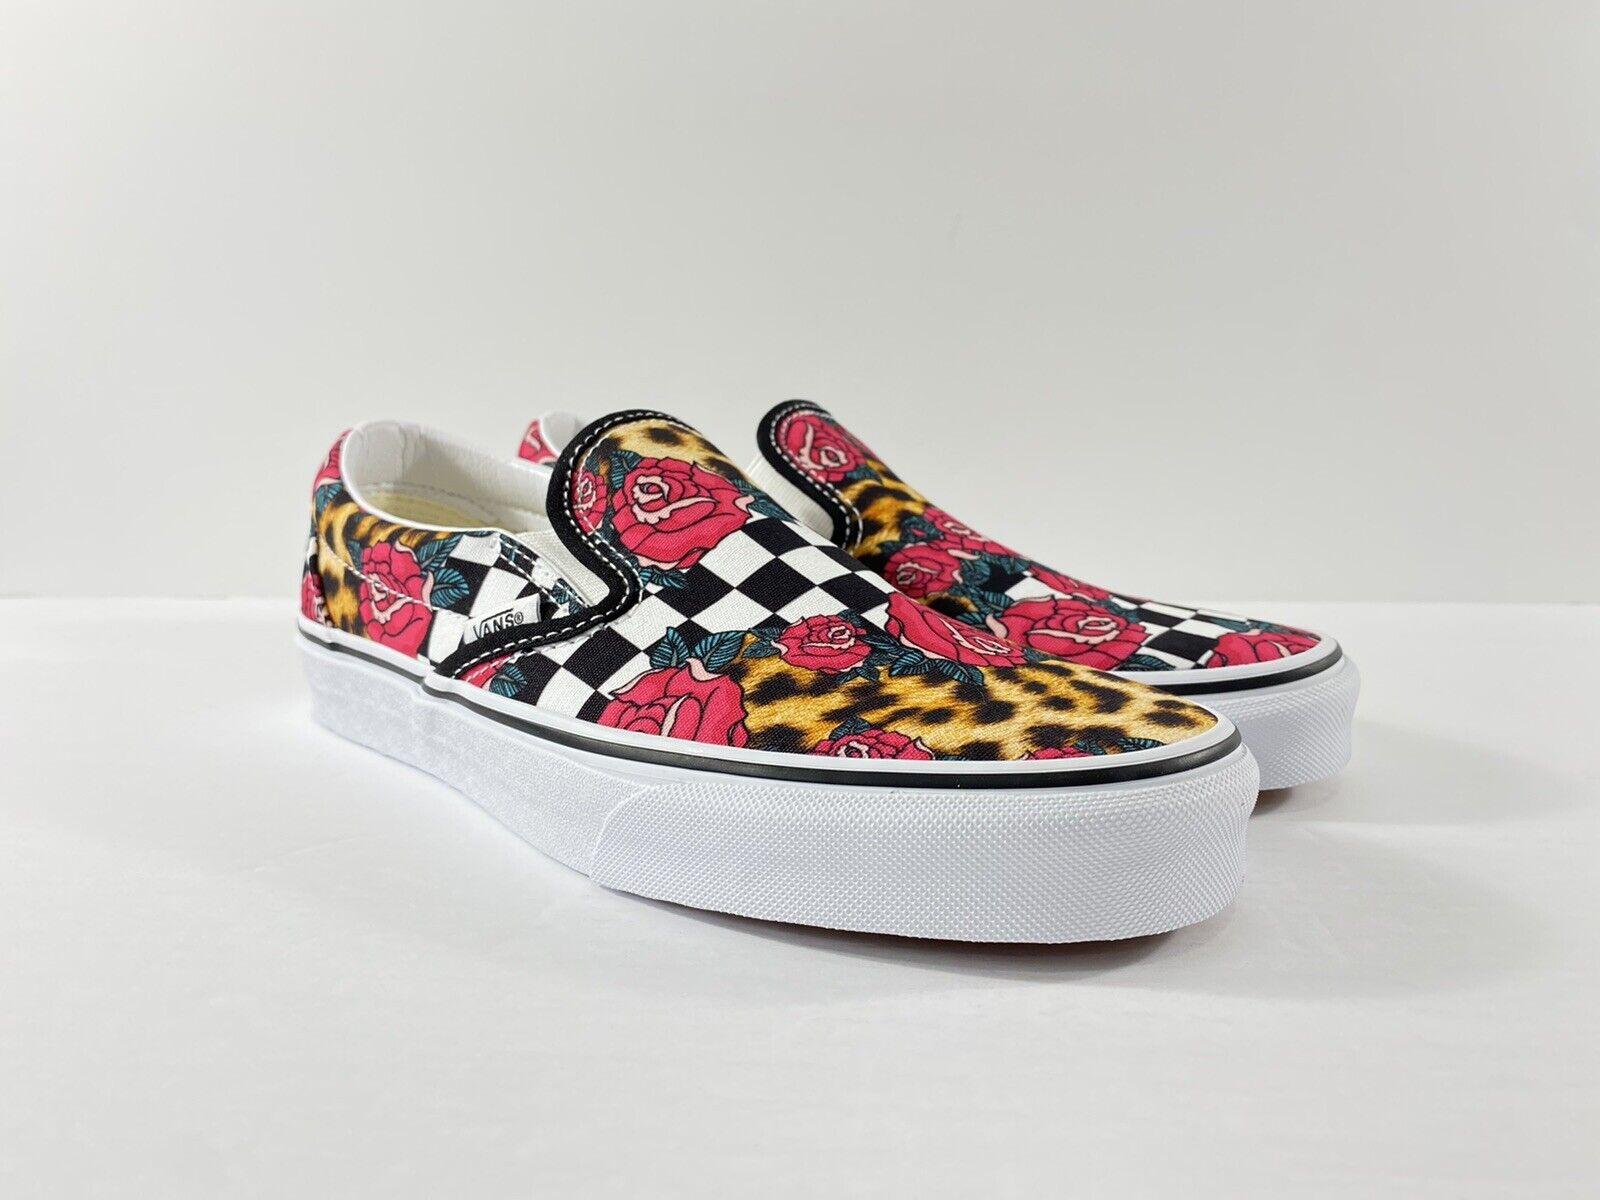 Vans Classic Slip-On Rose Animal Print Check Checkerboard Shoes New W/Box Men's